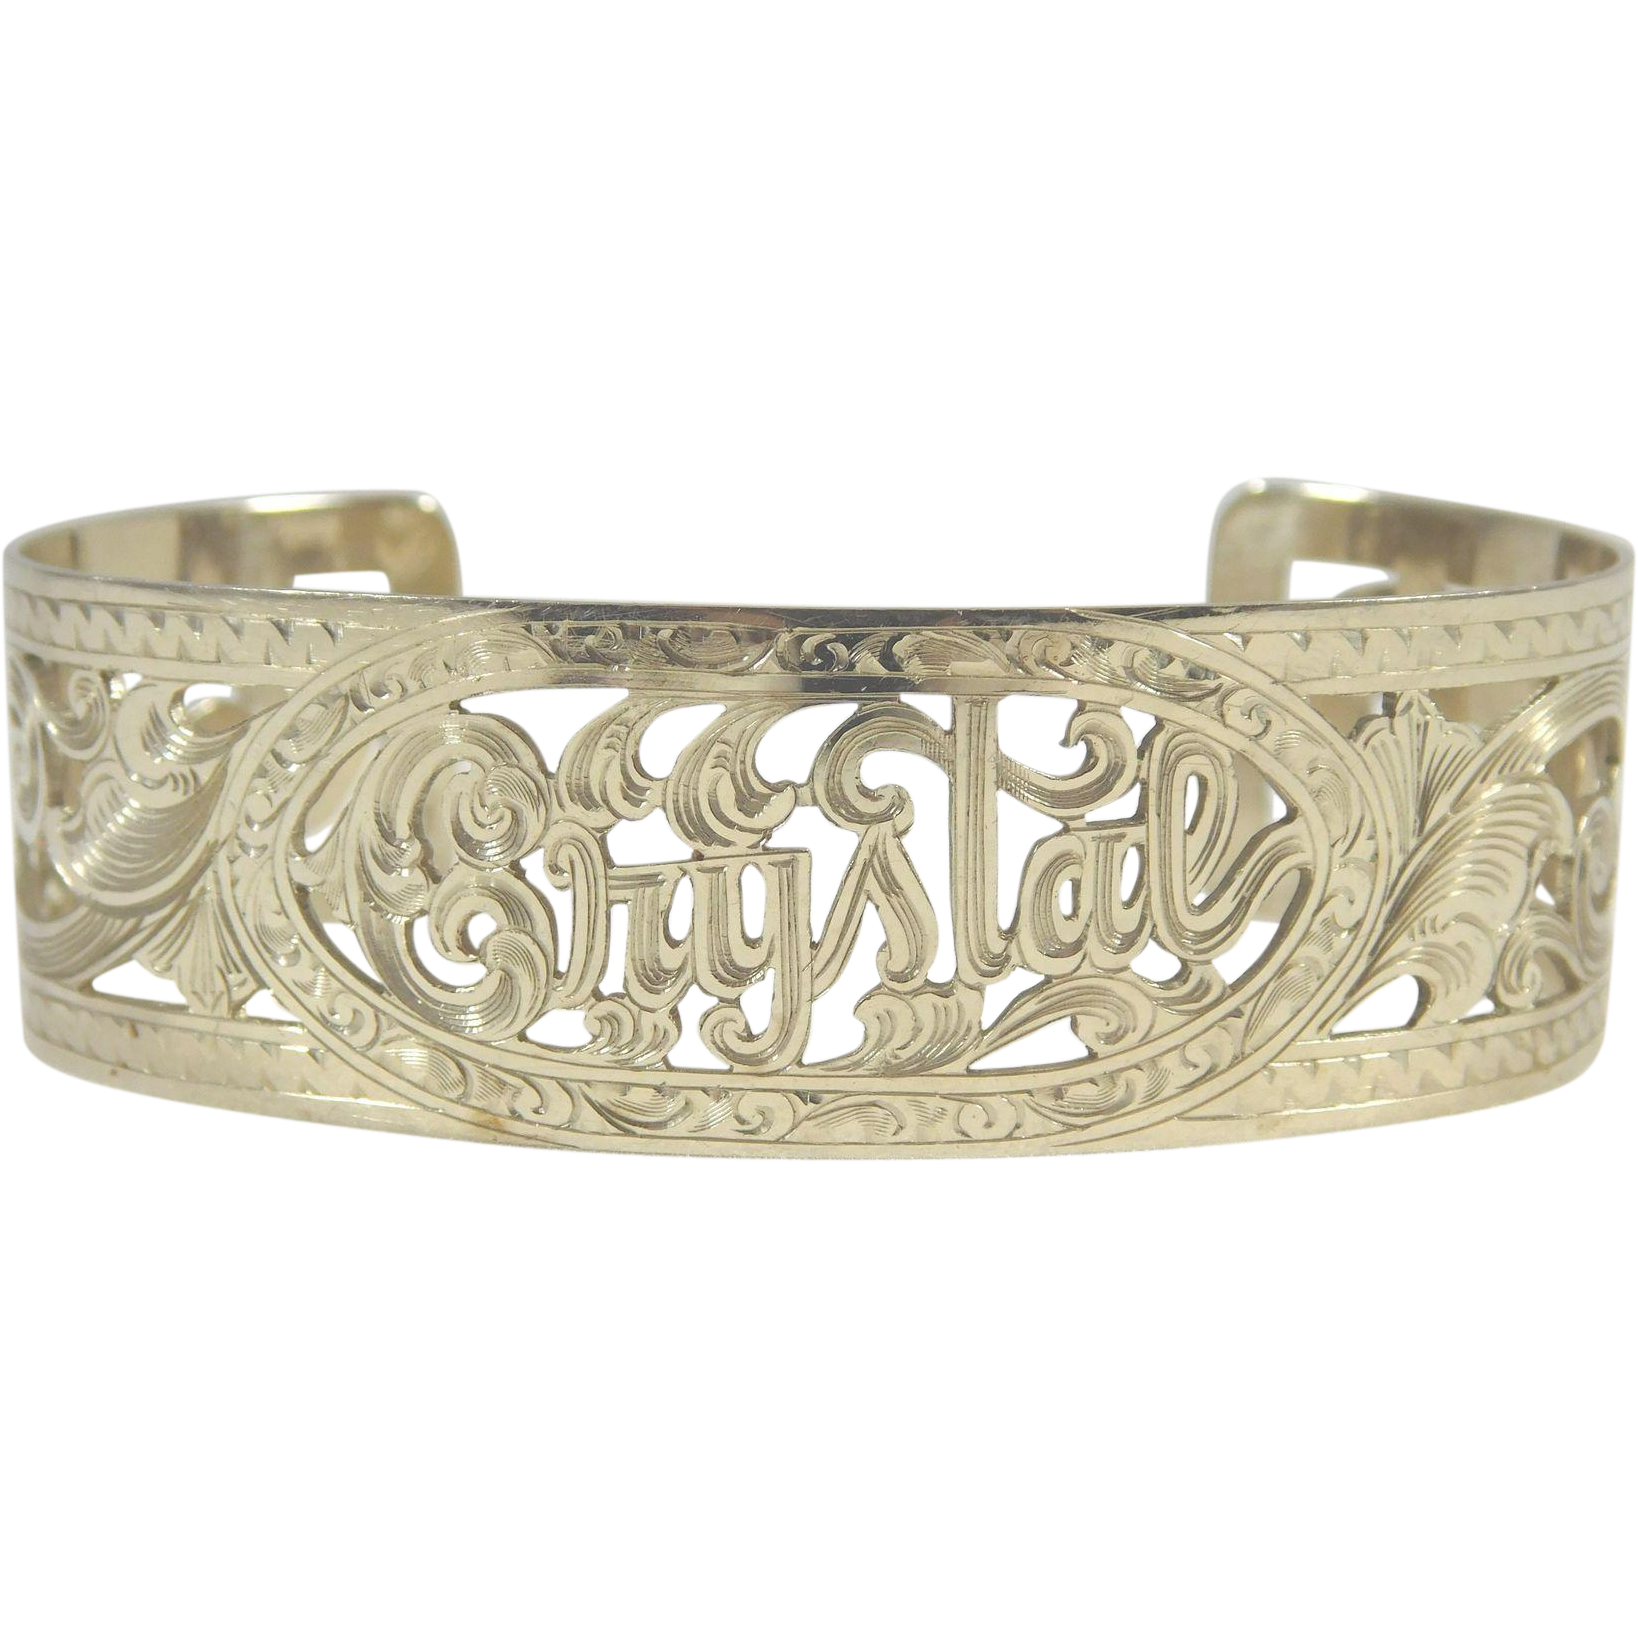 White Gold Cuff Bracelet: 14 Karat White Gold Designer Cuff Bracelet Monogrammed For